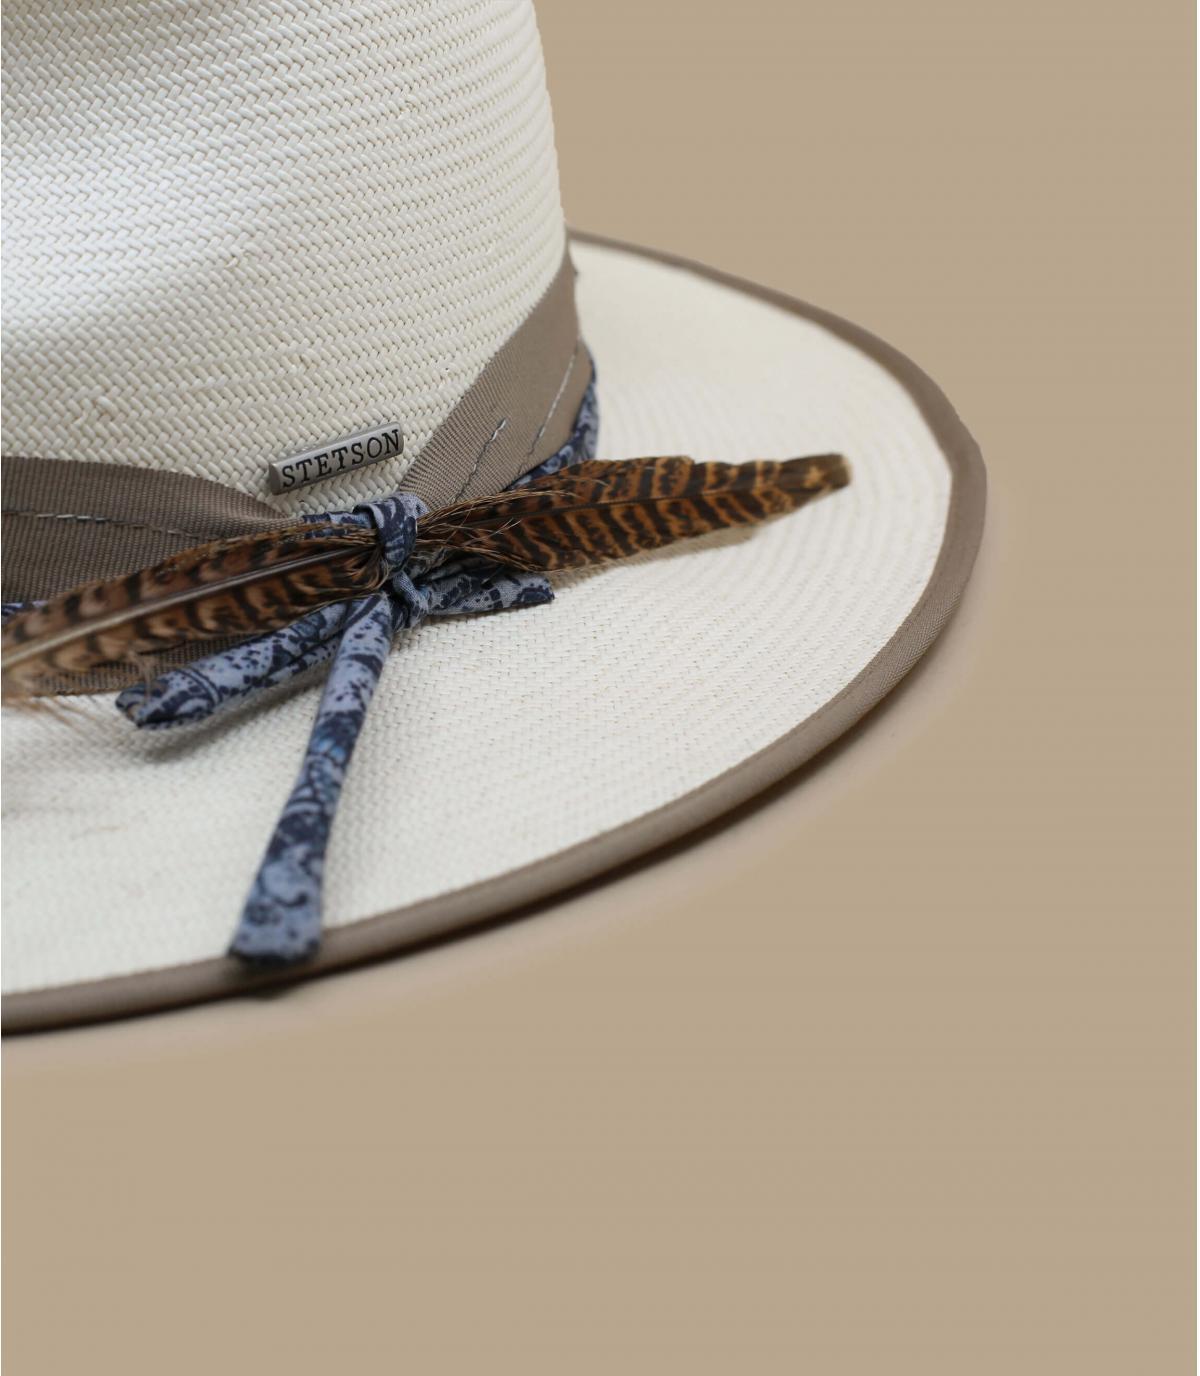 Dettagli Outdoor Toyo bleached - image 3